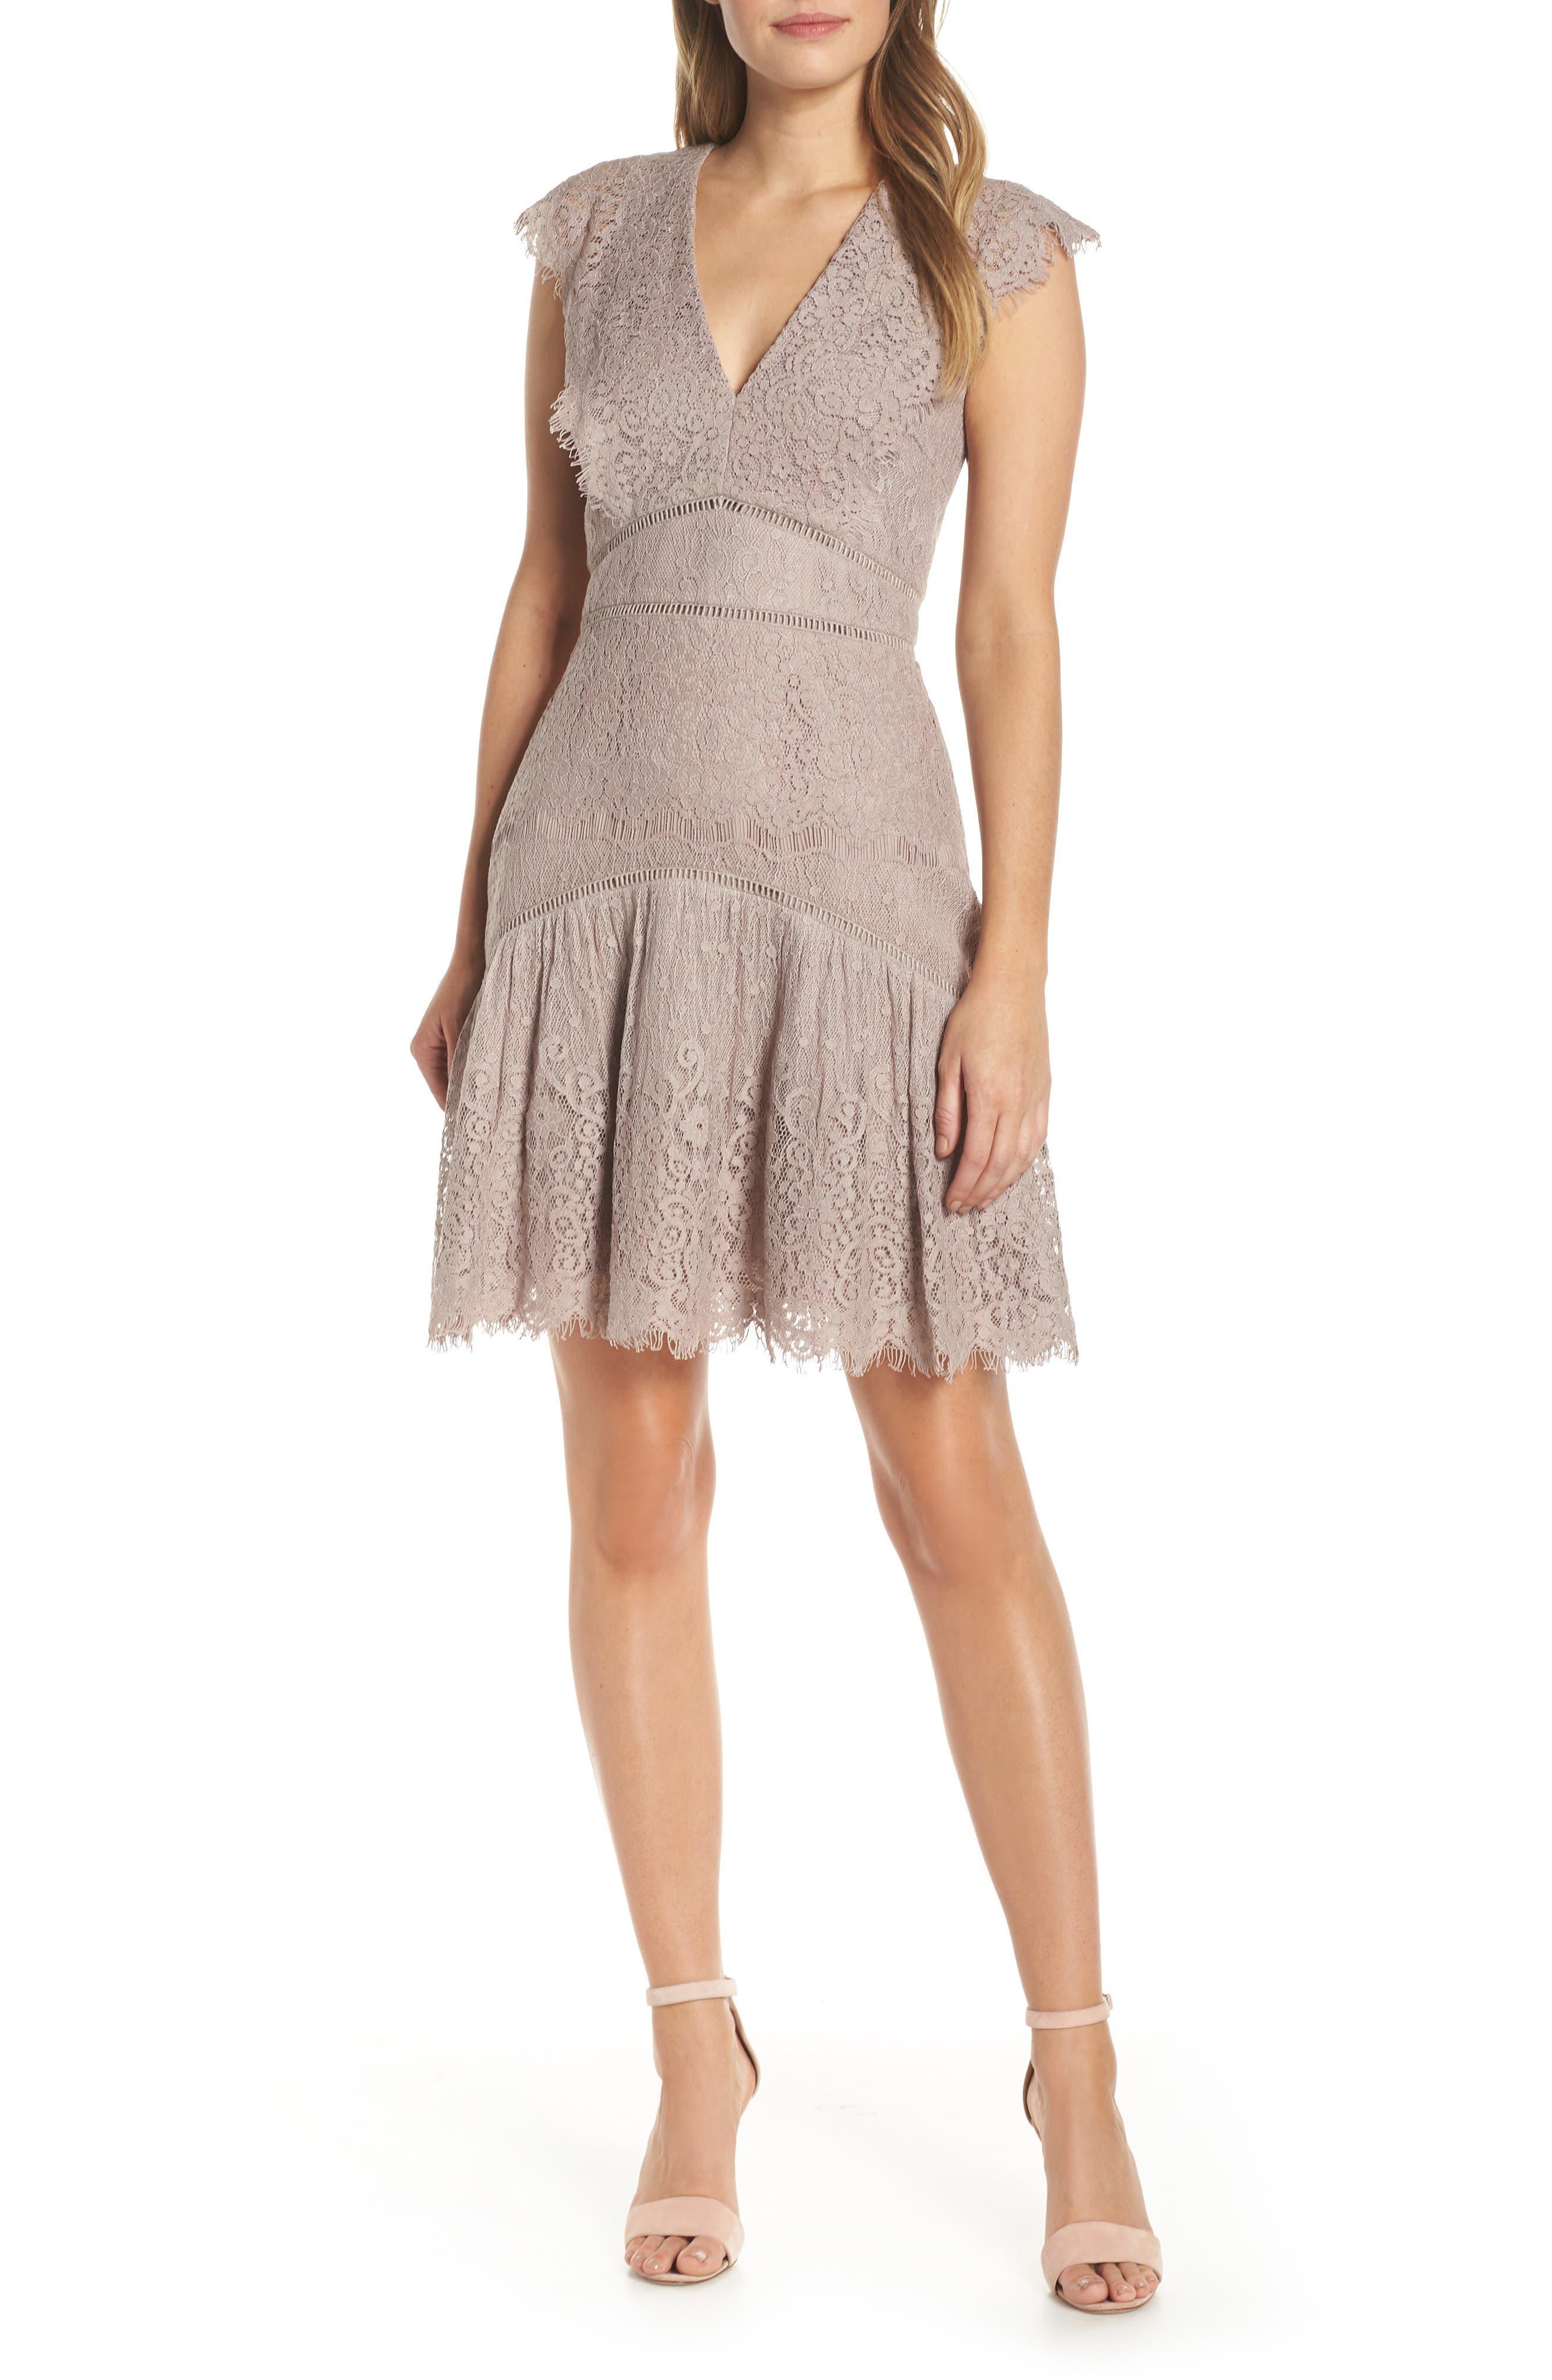 Adelyn Rae Shel Cap Sleeve Eyelash Lace Dress, Pink